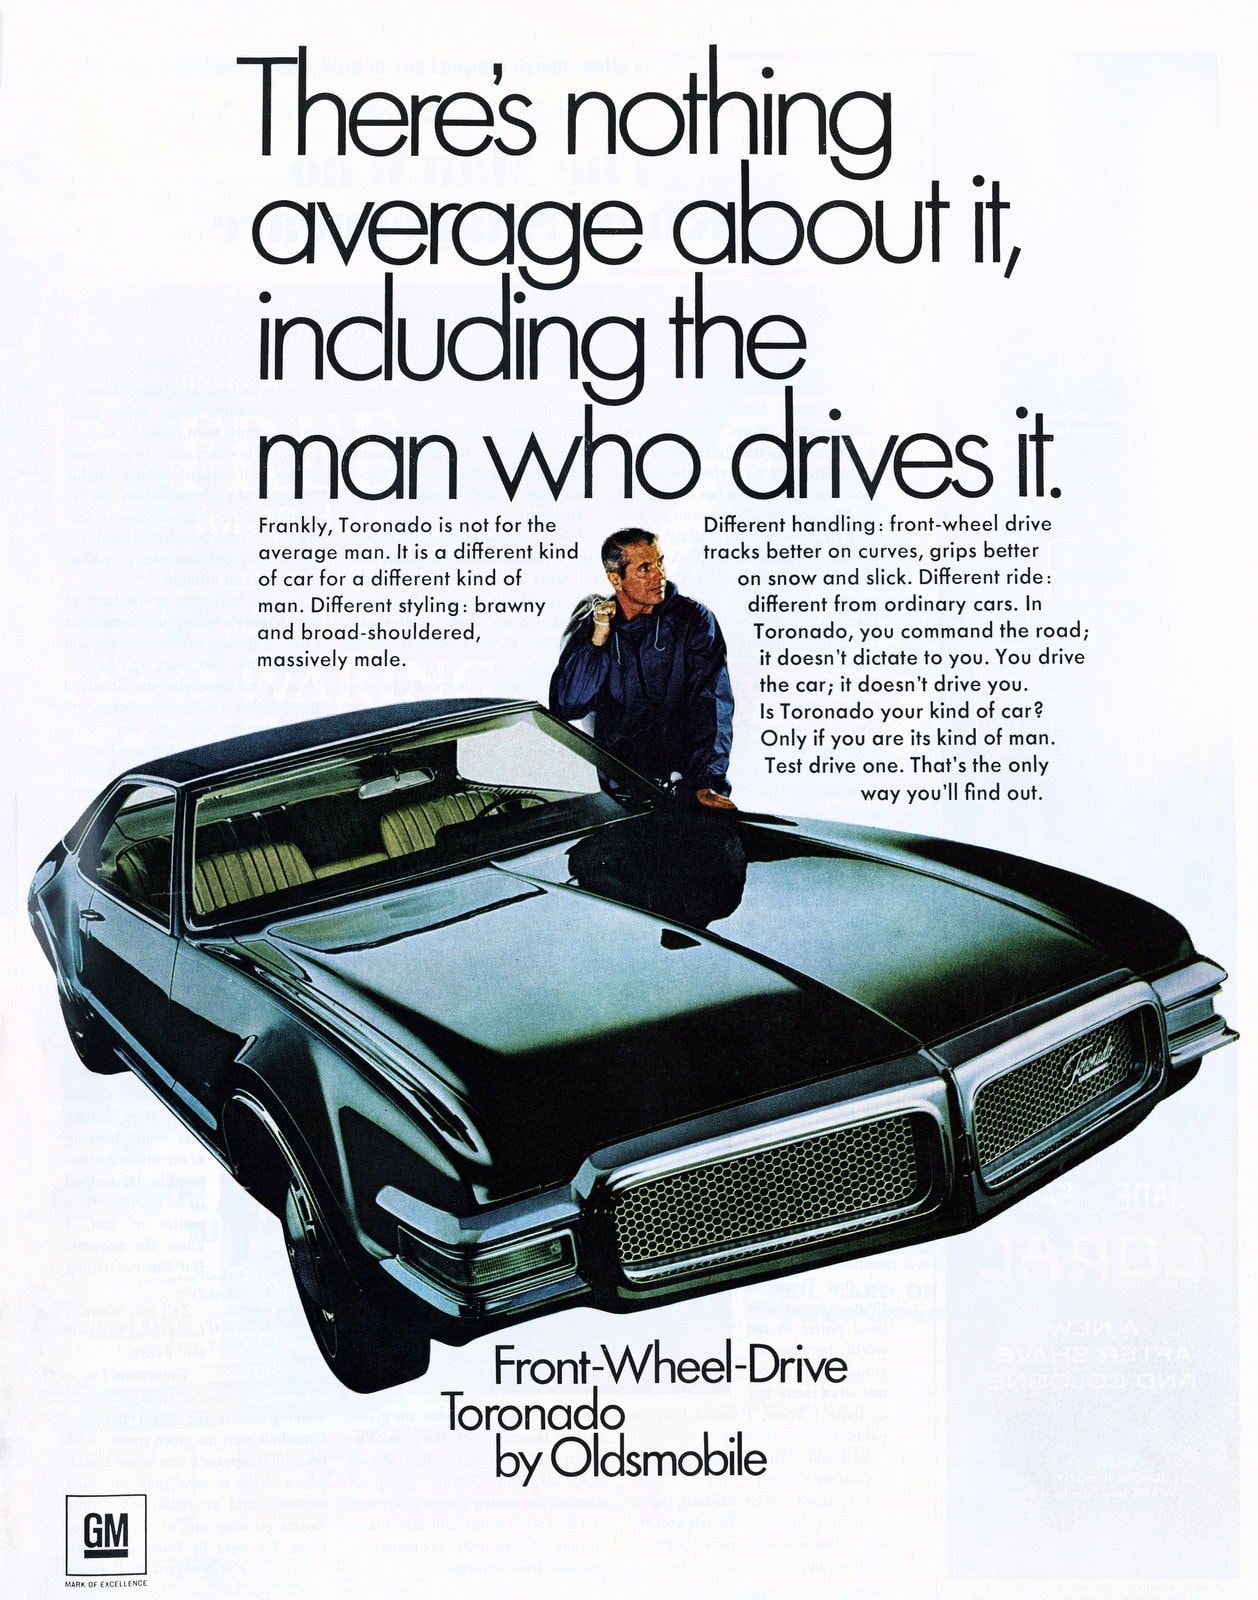 Front-wheel drive Toronado by Oldsmobile - 1967 ad for 1968 model